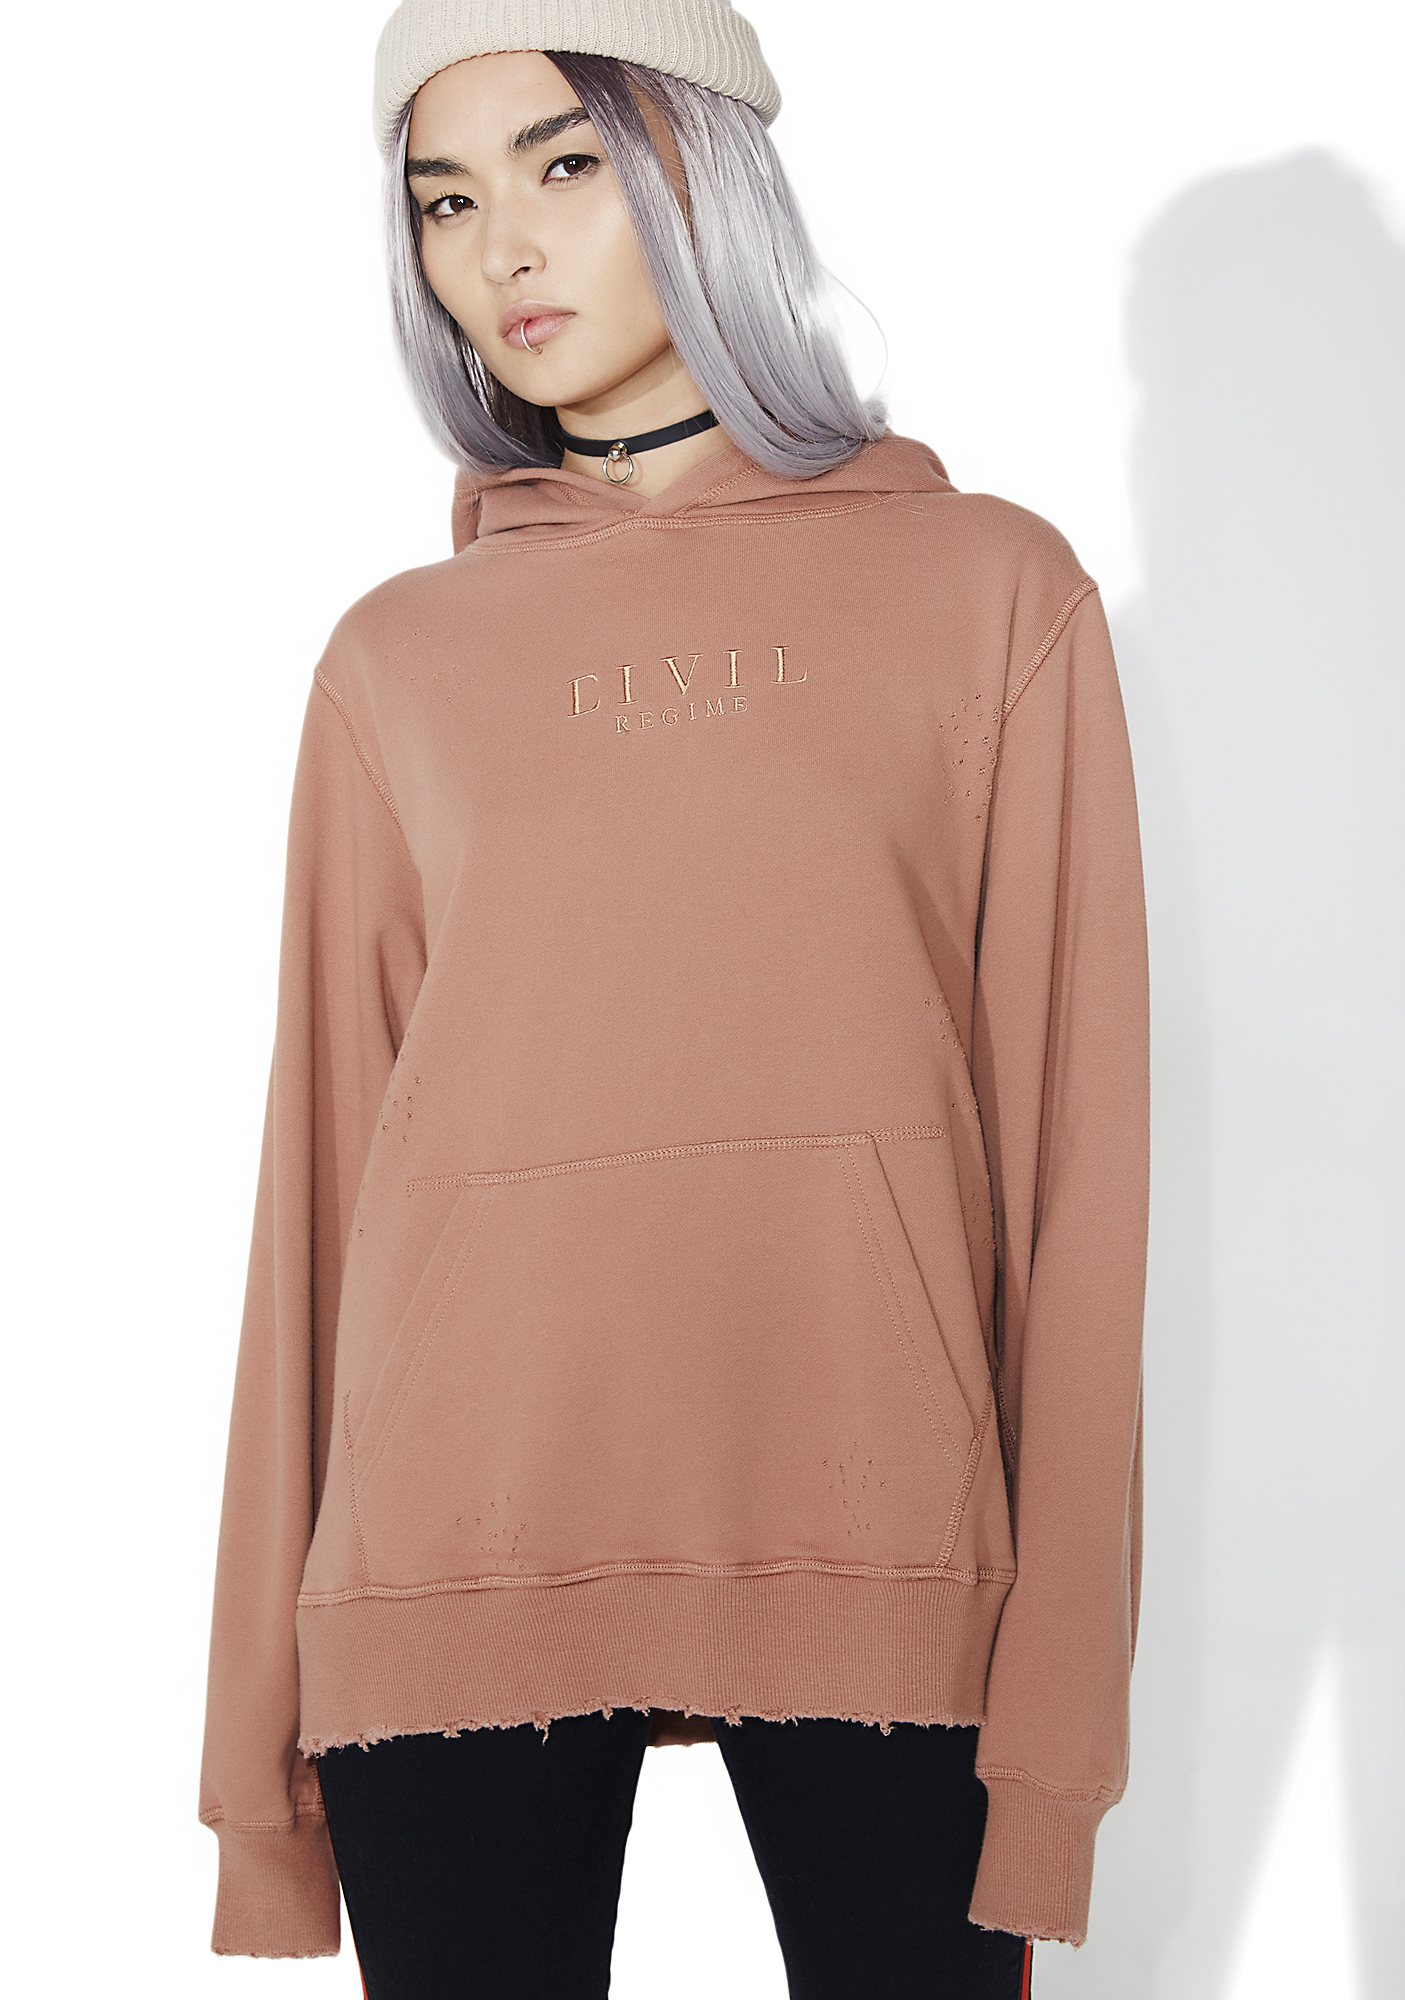 Civil Clothing Blasted Pullover Hoodie